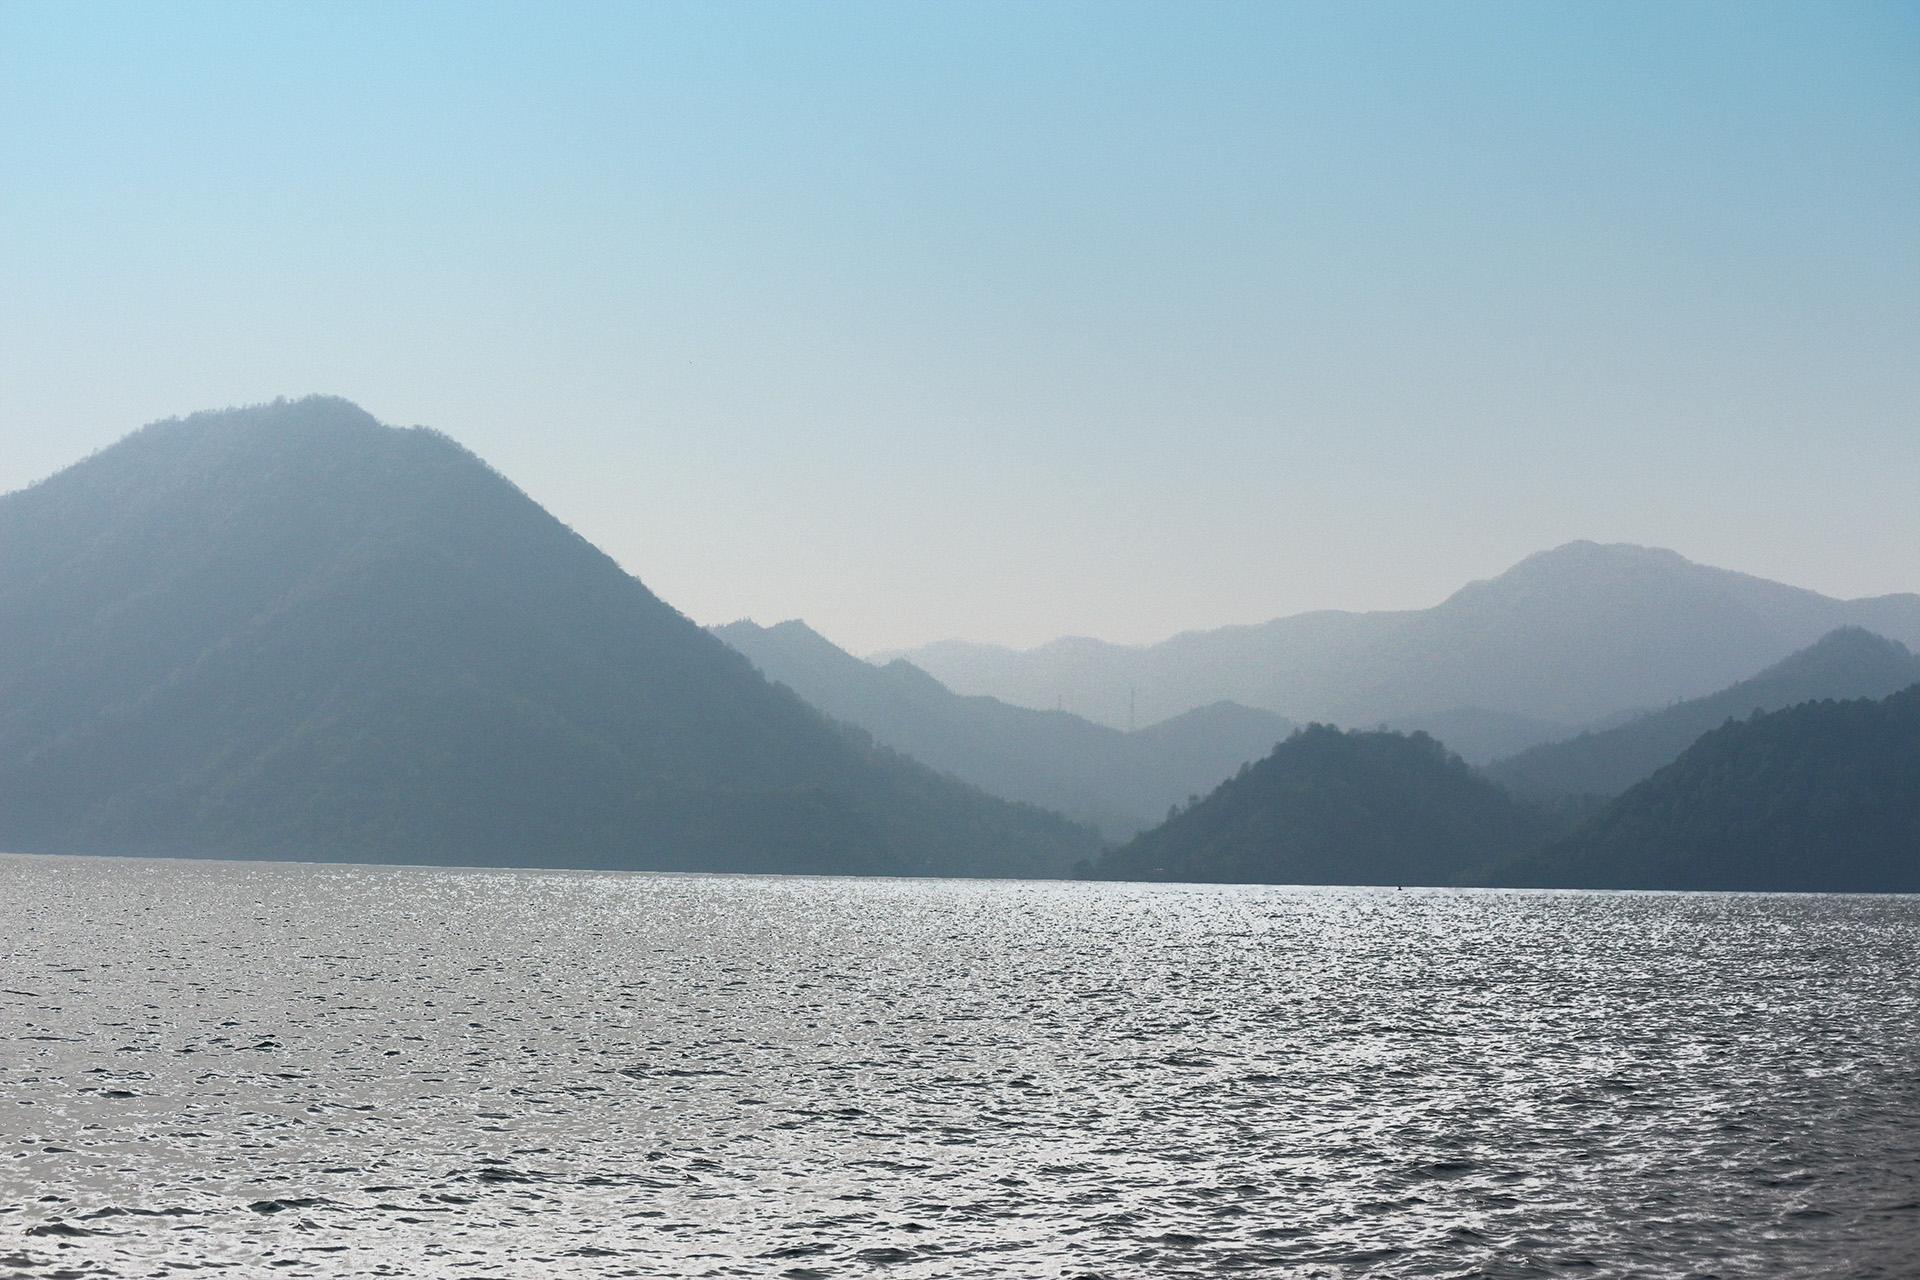 @太平湖 Canon 700D